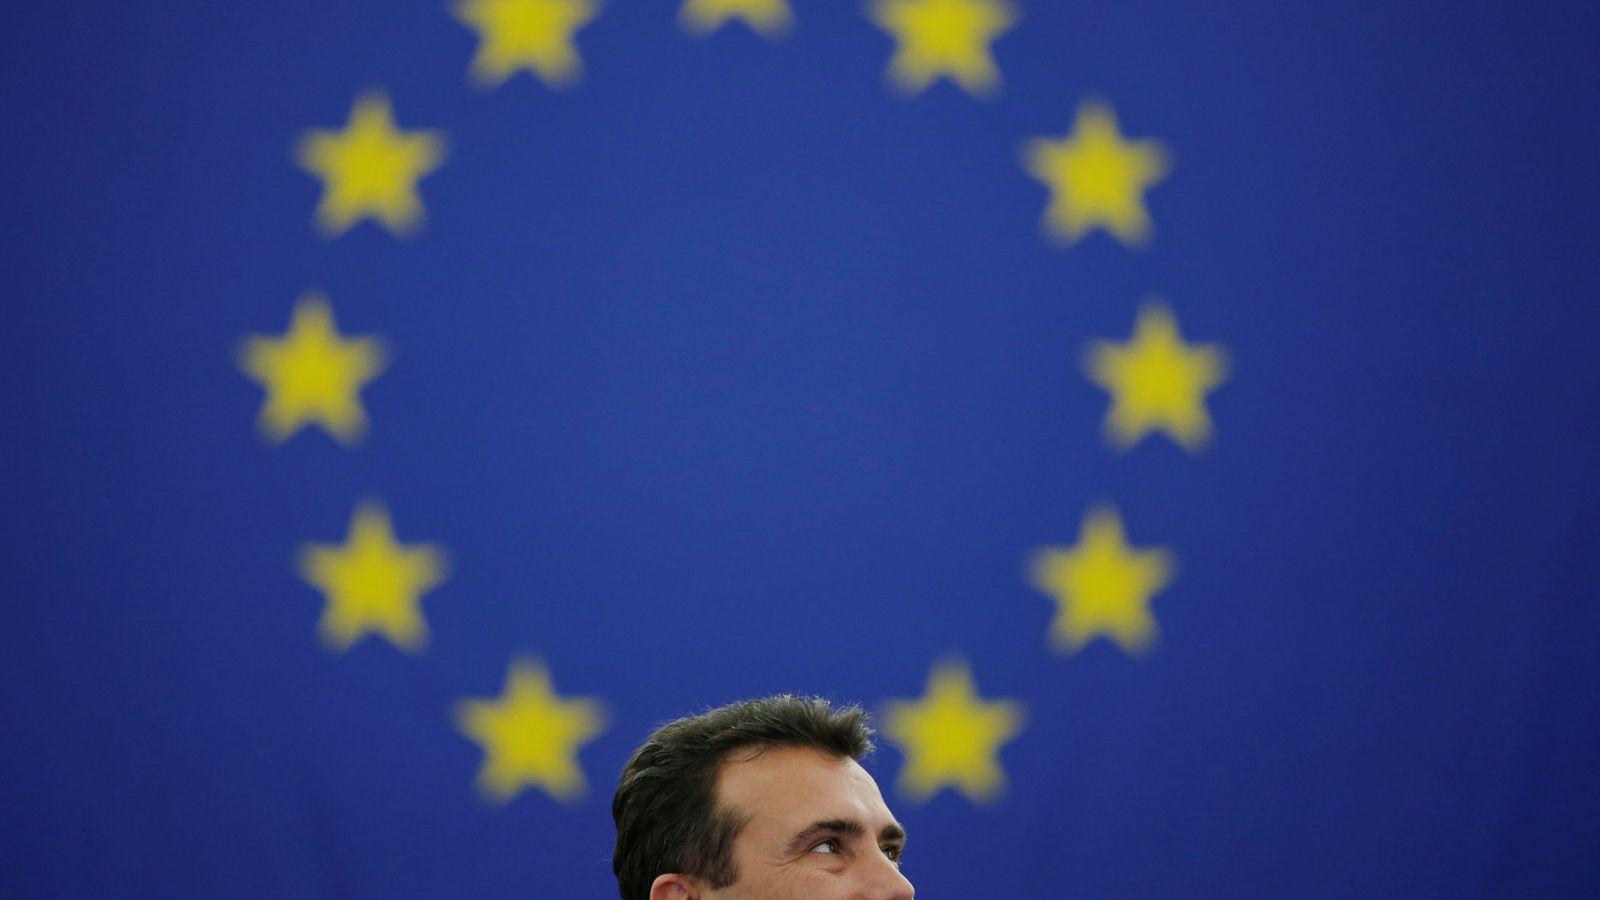 Foto: Macedonian prime minister zaev addresses the european parliament in strasbourg